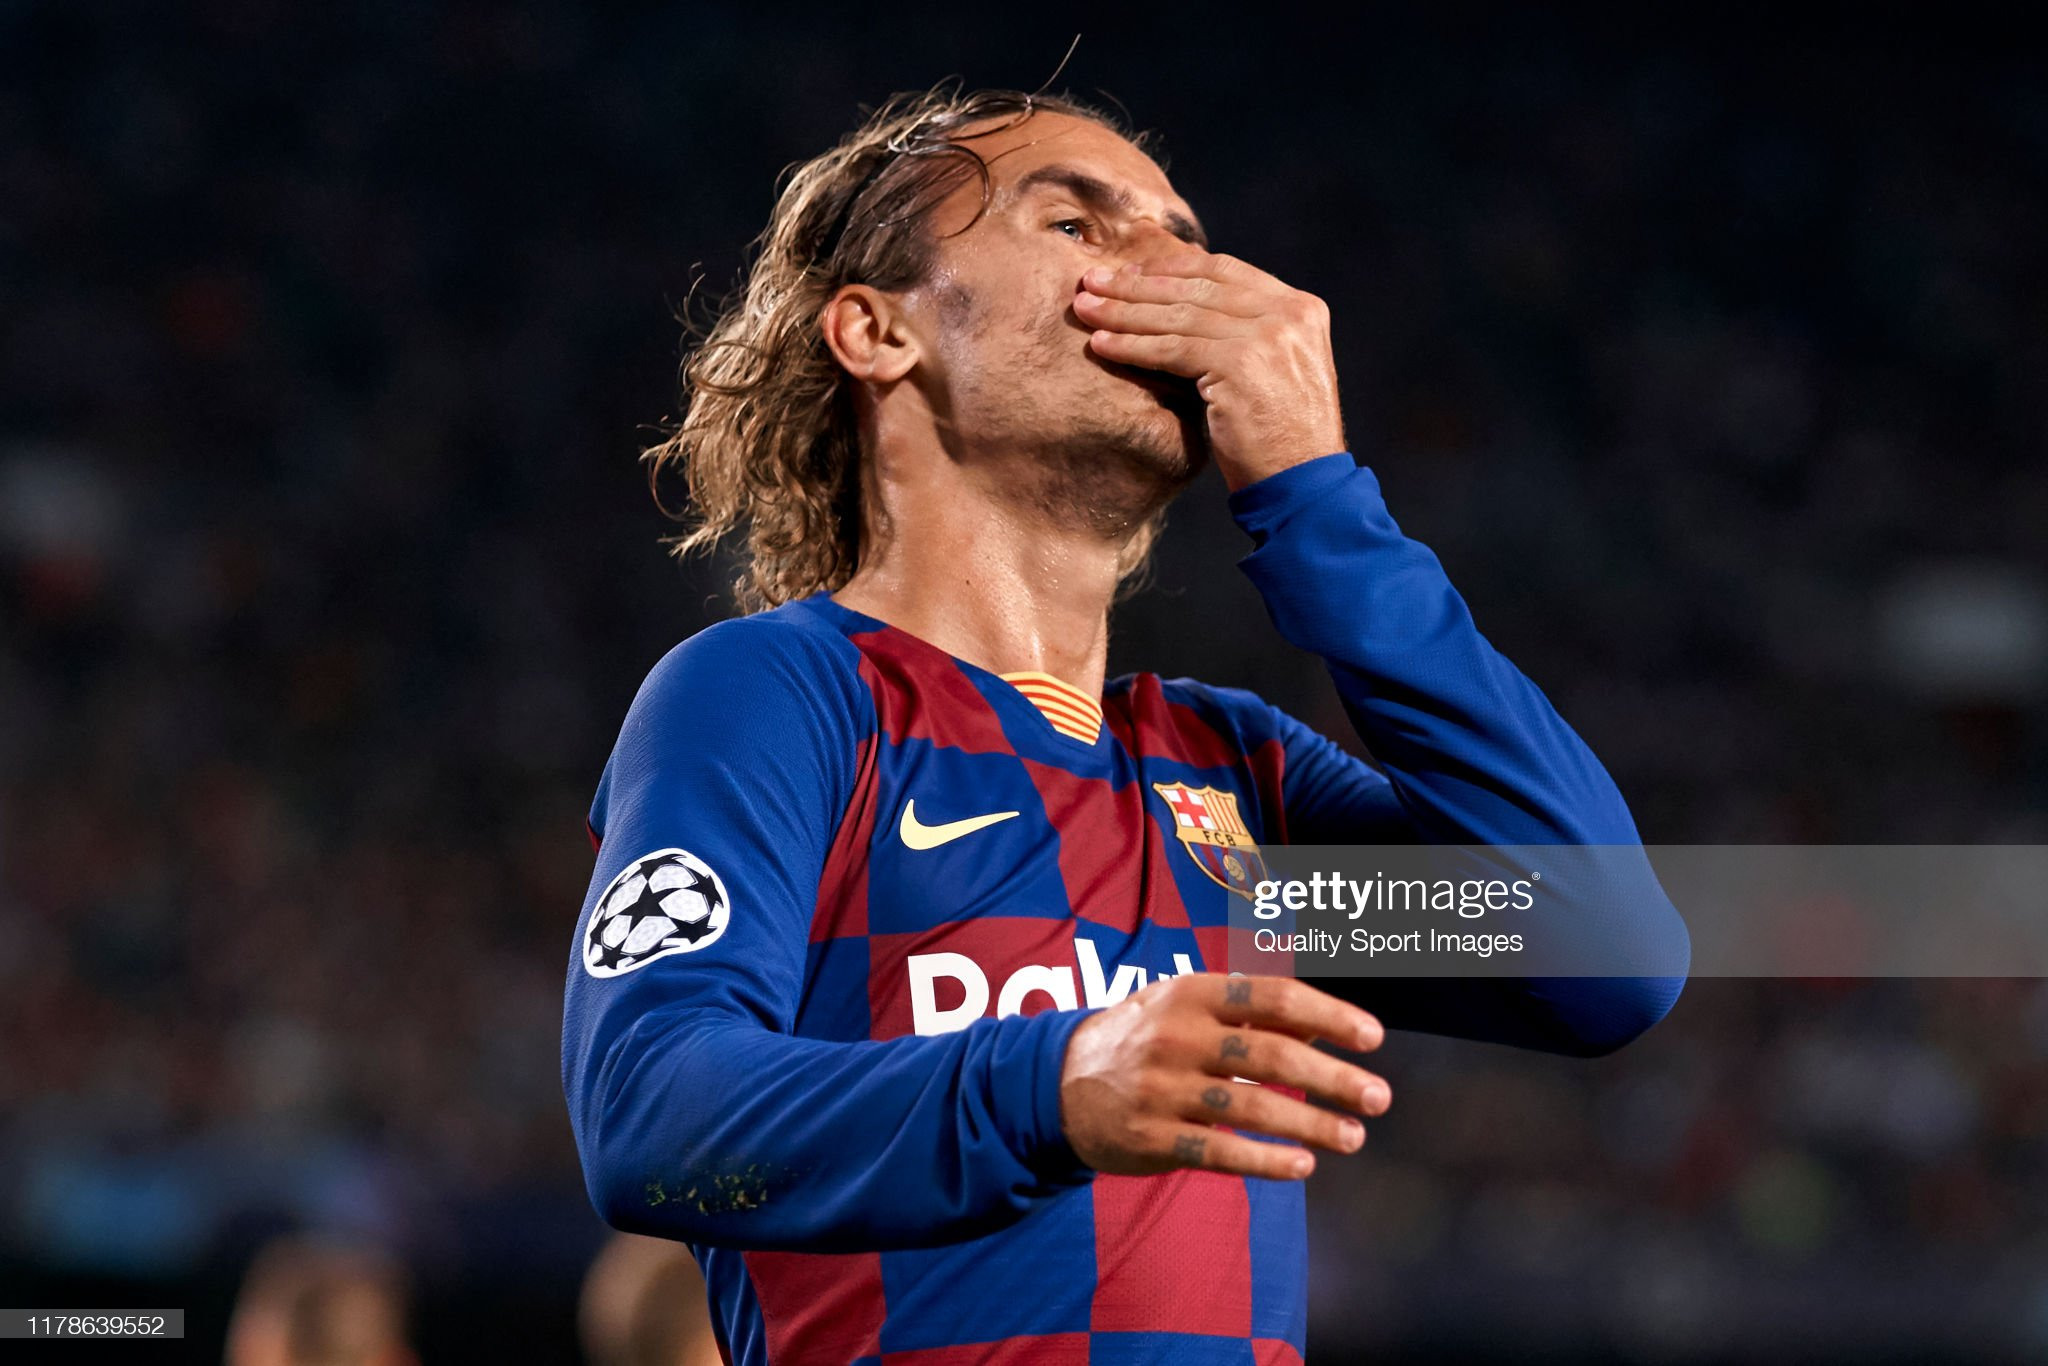 صور مباراة : برشلونة - إنتر 2-1 ( 02-10-2019 )  Antoine-griezmann-of-fc-barcelona-reacts-during-the-uefa-champions-picture-id1178639552?s=2048x2048